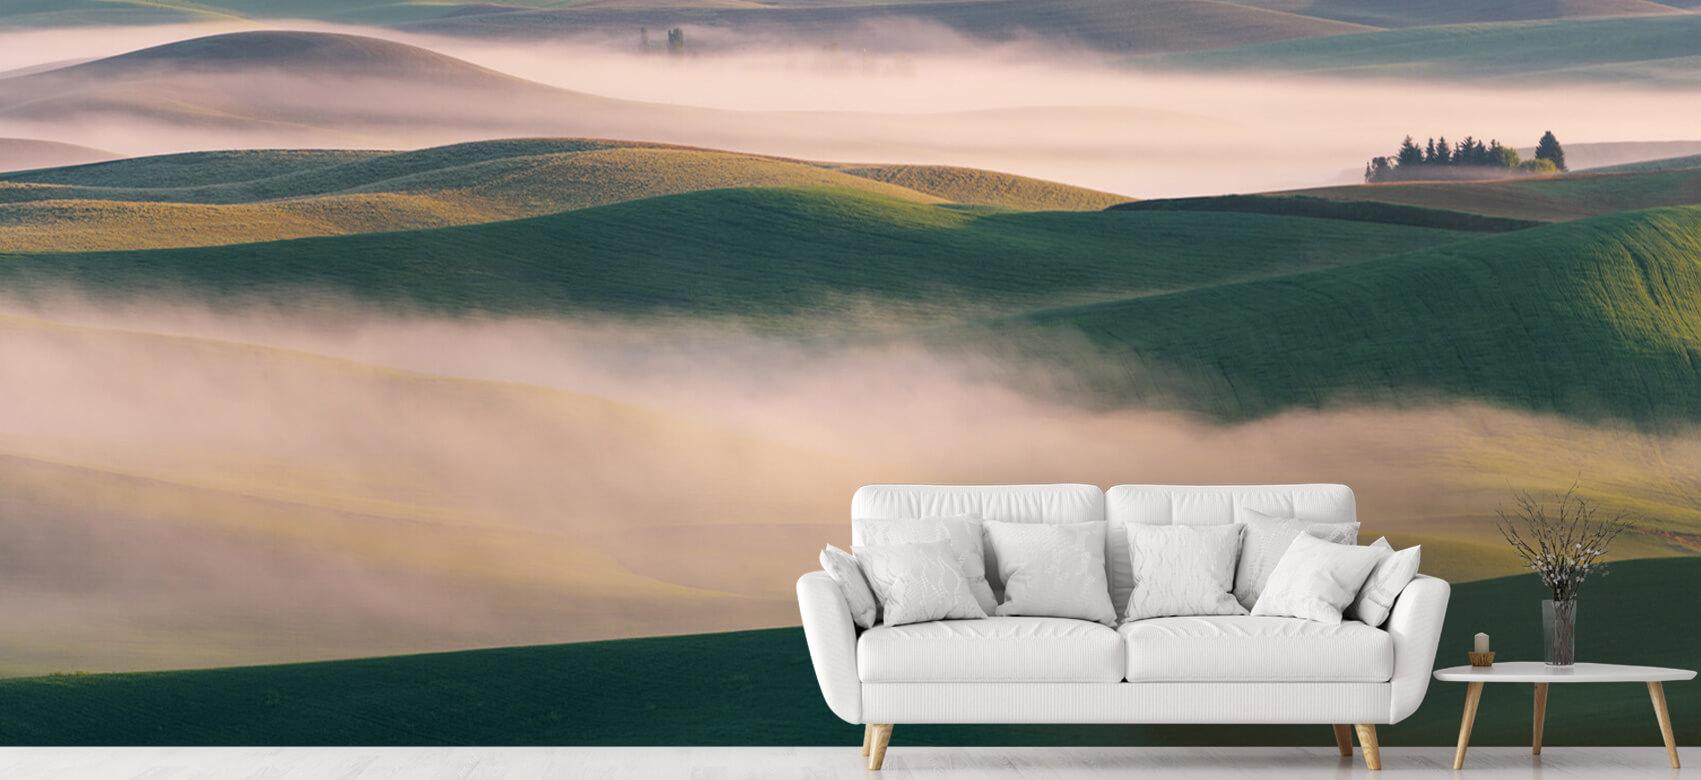 Landschap Dream Land in Morning Mist 5